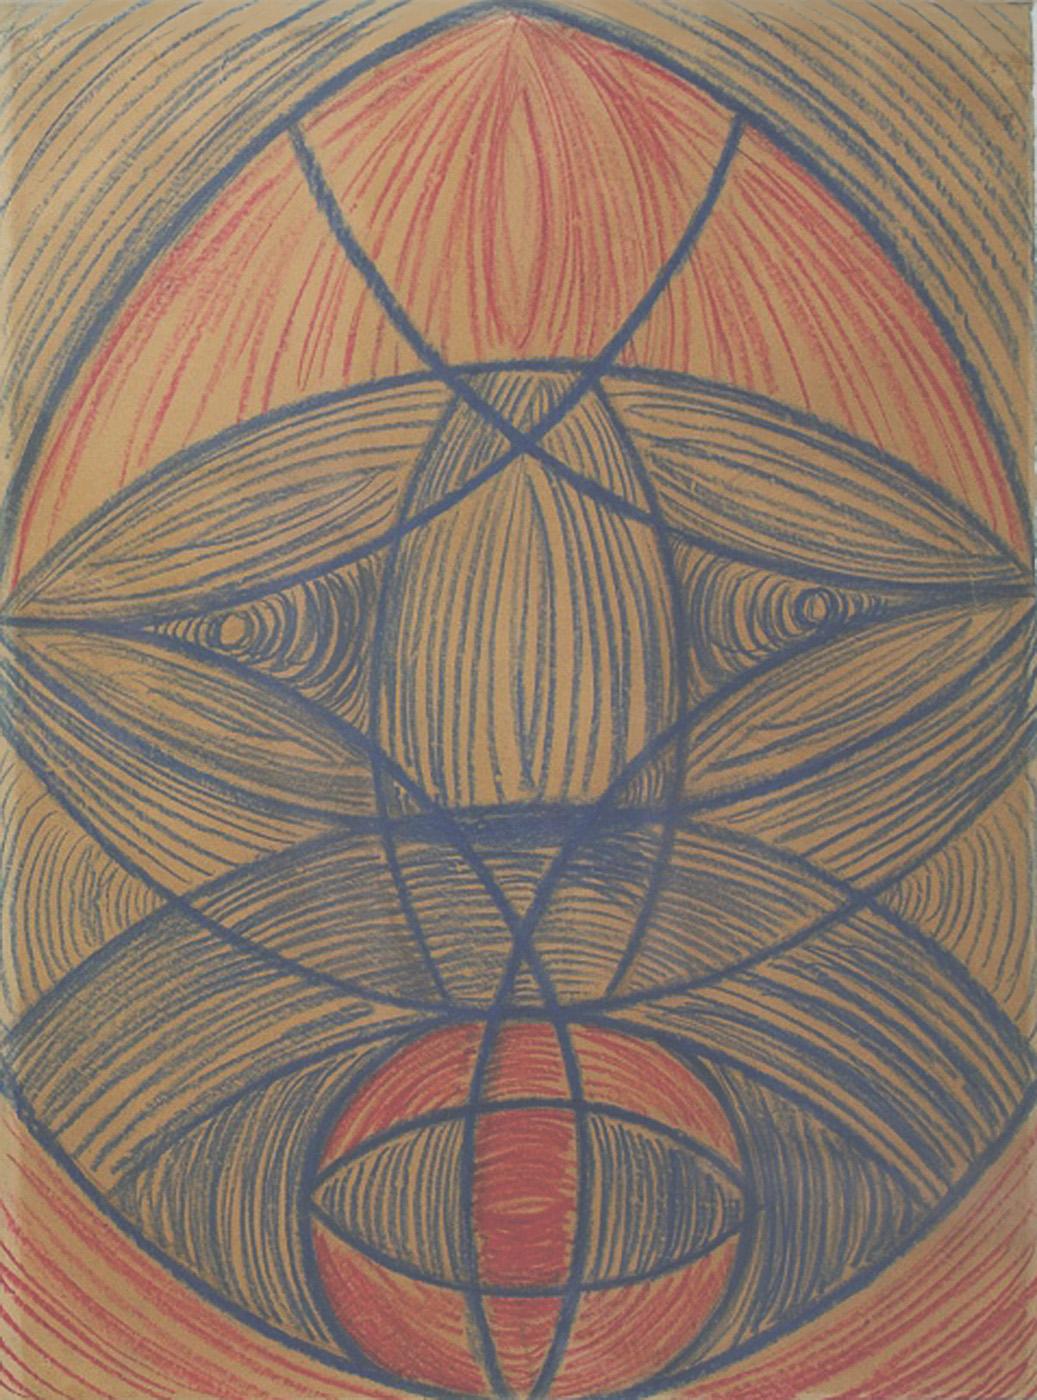 "Vaslav Nijinsky, ""The Mask"" (1919), pastel on paper (© Vaslav Nijinsky, courtesy Bethlem Museum of the Mind, Beckenham, Kent)"